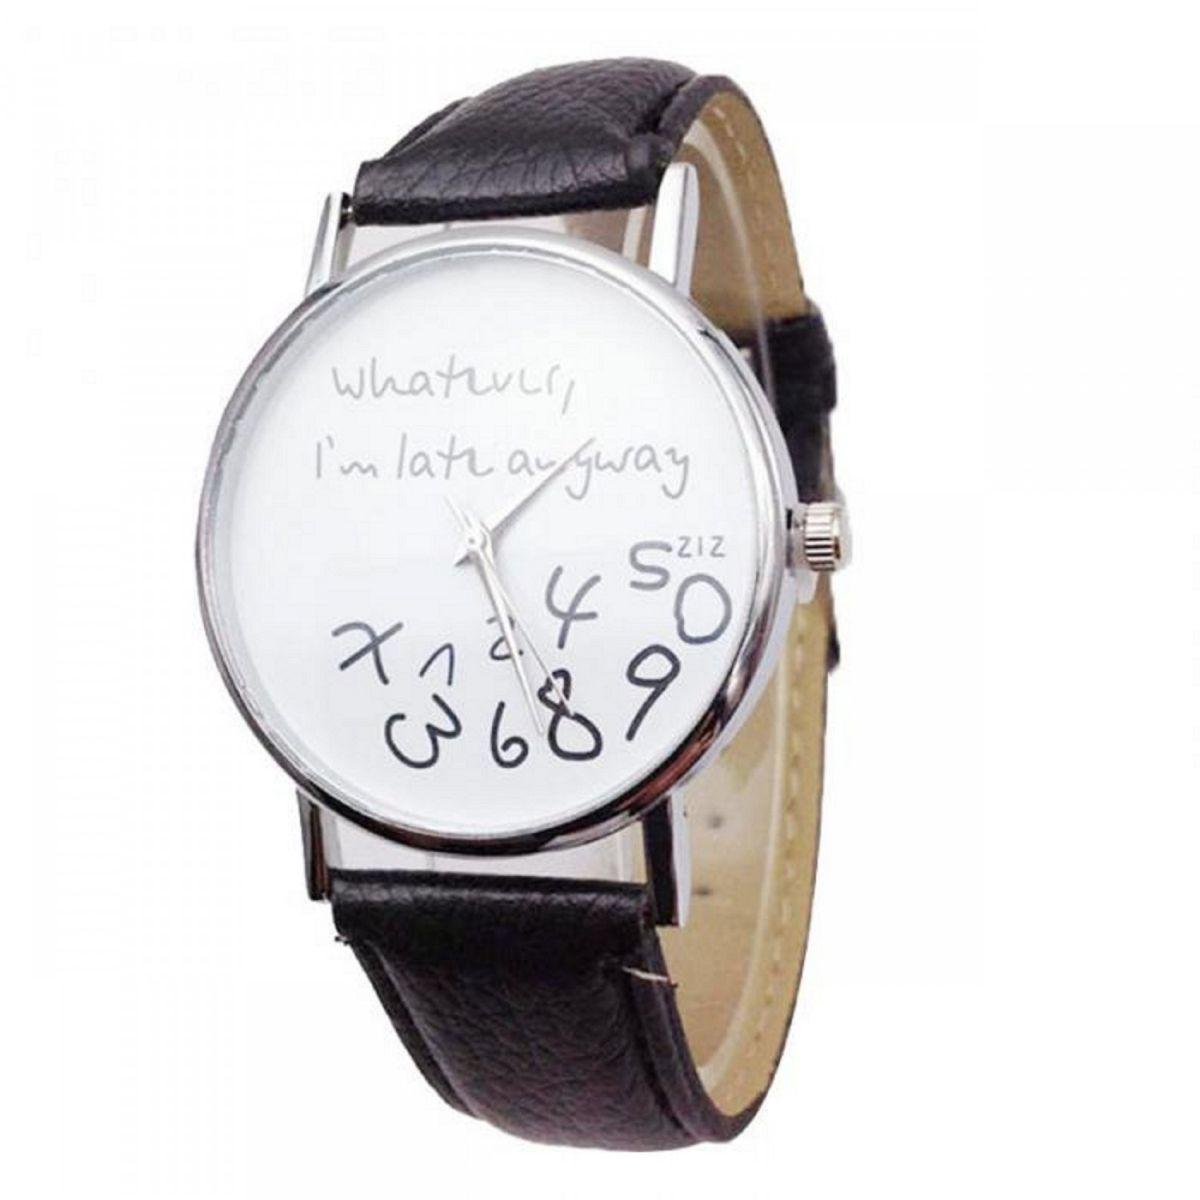 Skylofts PU Leather Wathever I am Late Anyway Wristwatch Men Women Luxury Watch - Black